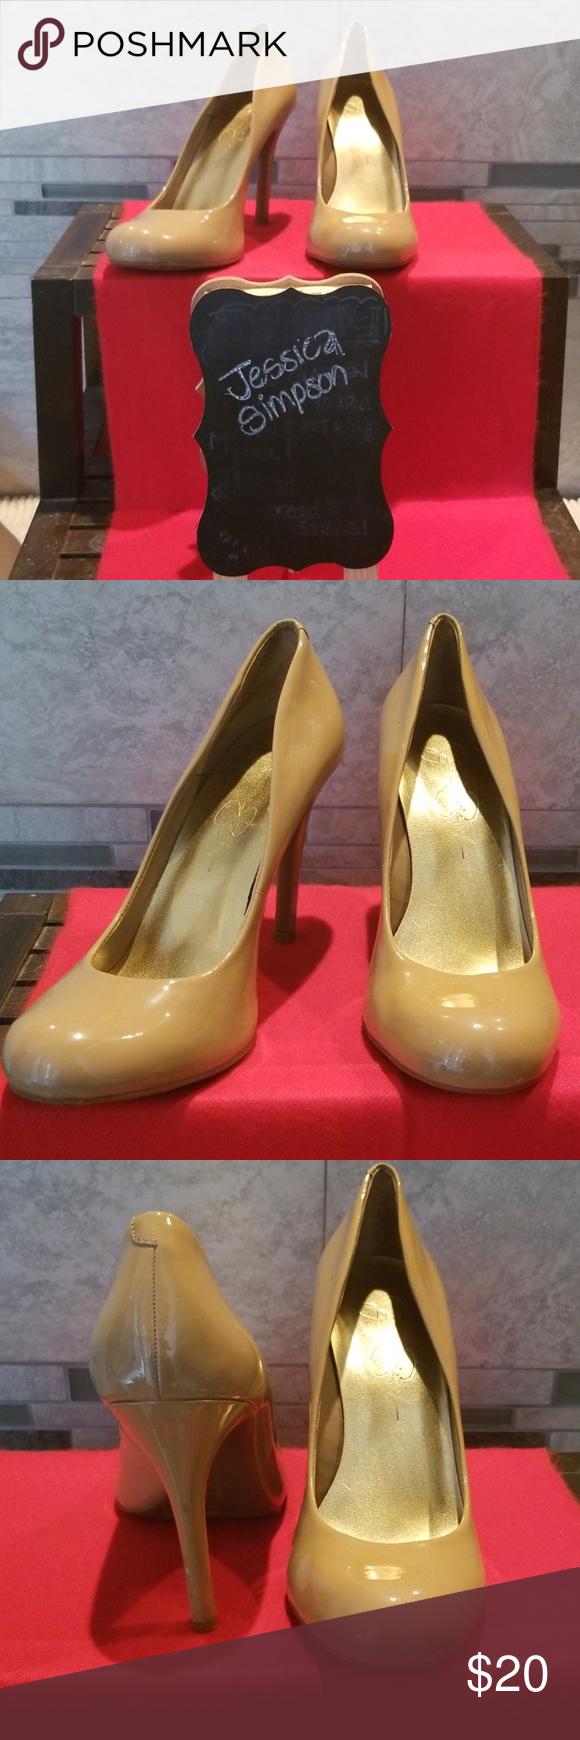 b3c682847c6 Jessica Simpson Leather nude Heels Very nice pair of Jessica Simpson ...